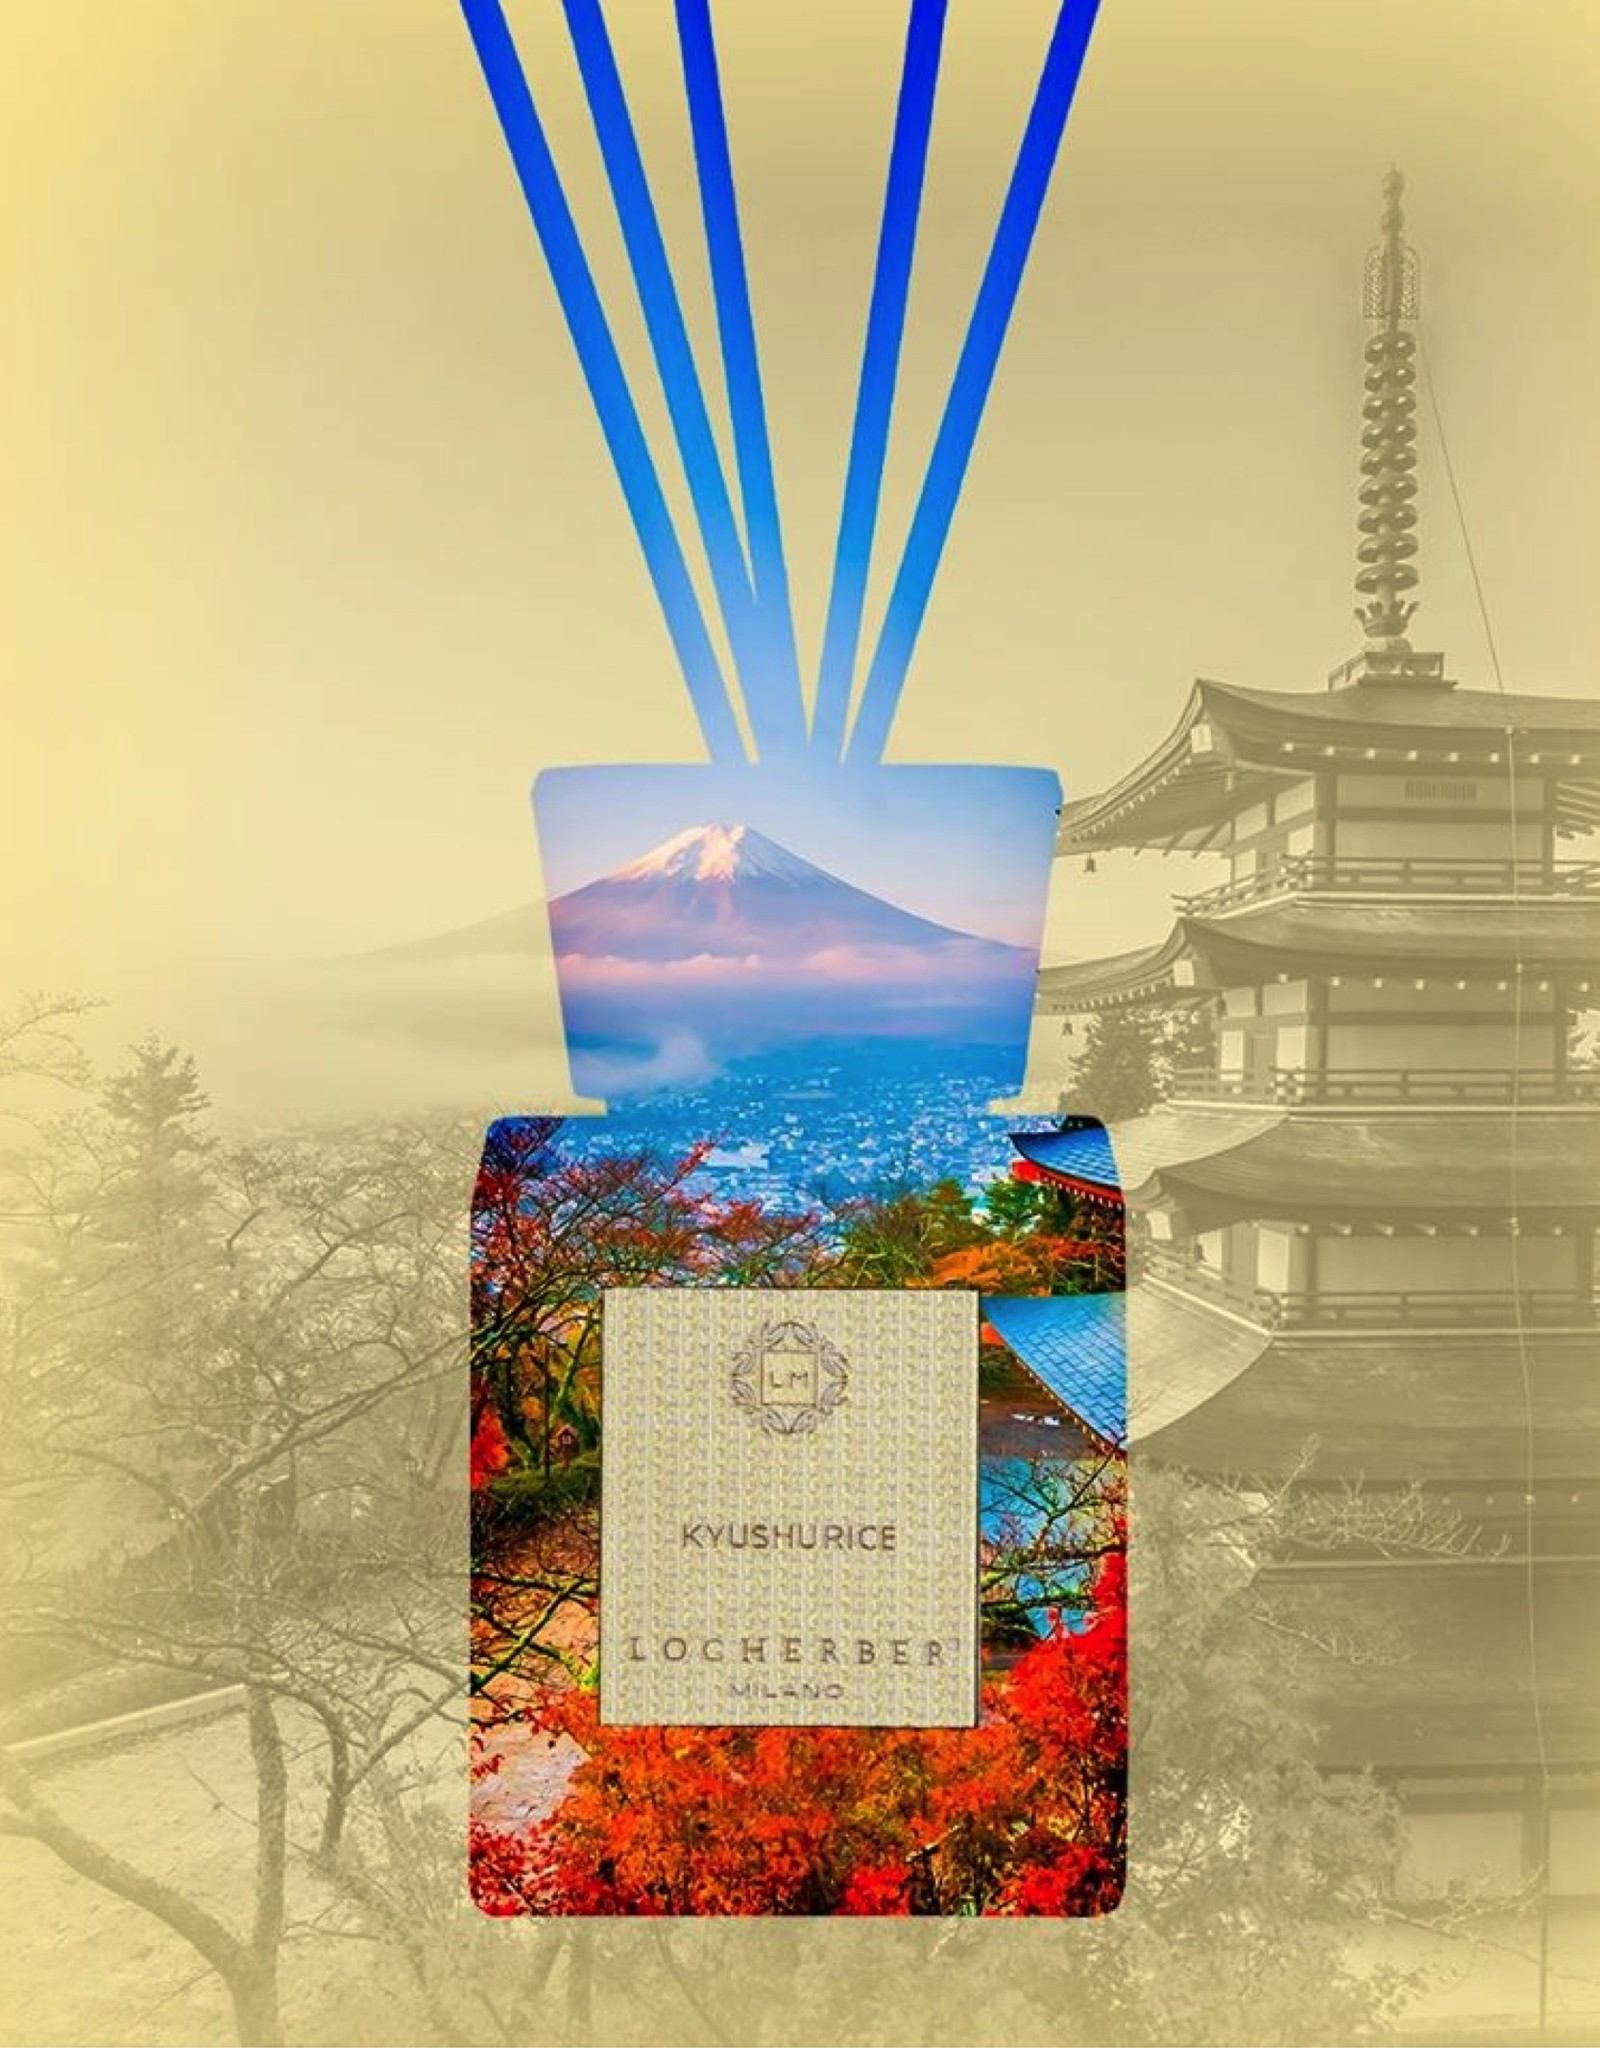 Locherber Locherber Milano - Kyushu Rice - Diffuser Gift Box